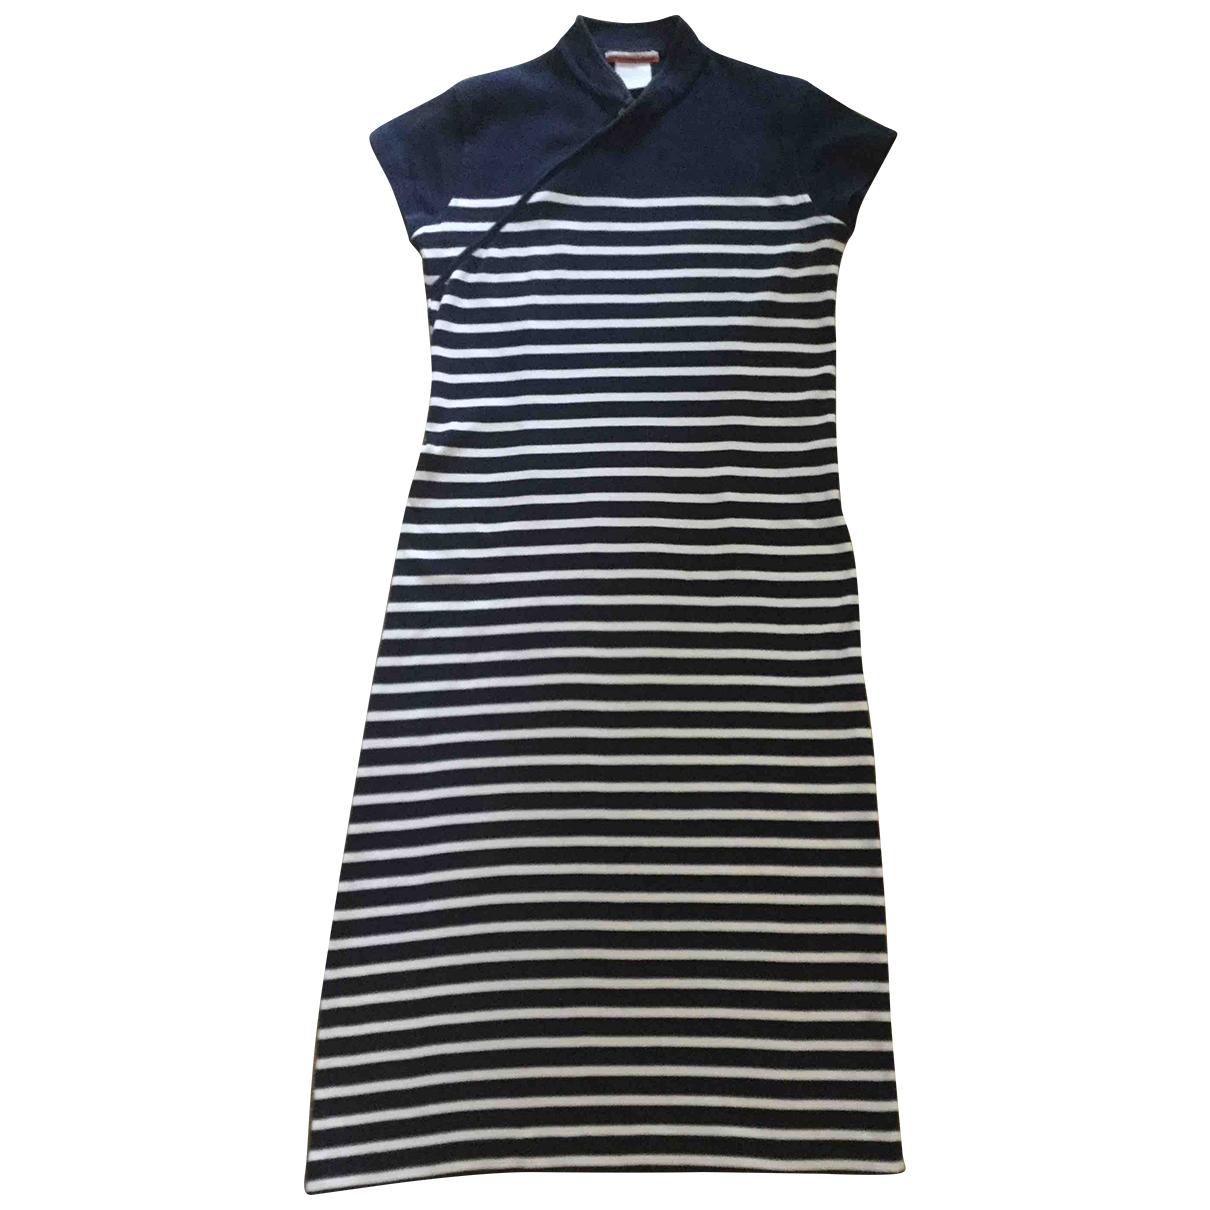 Jean Paul Gaultier \N Navy Cotton dress for Women M International